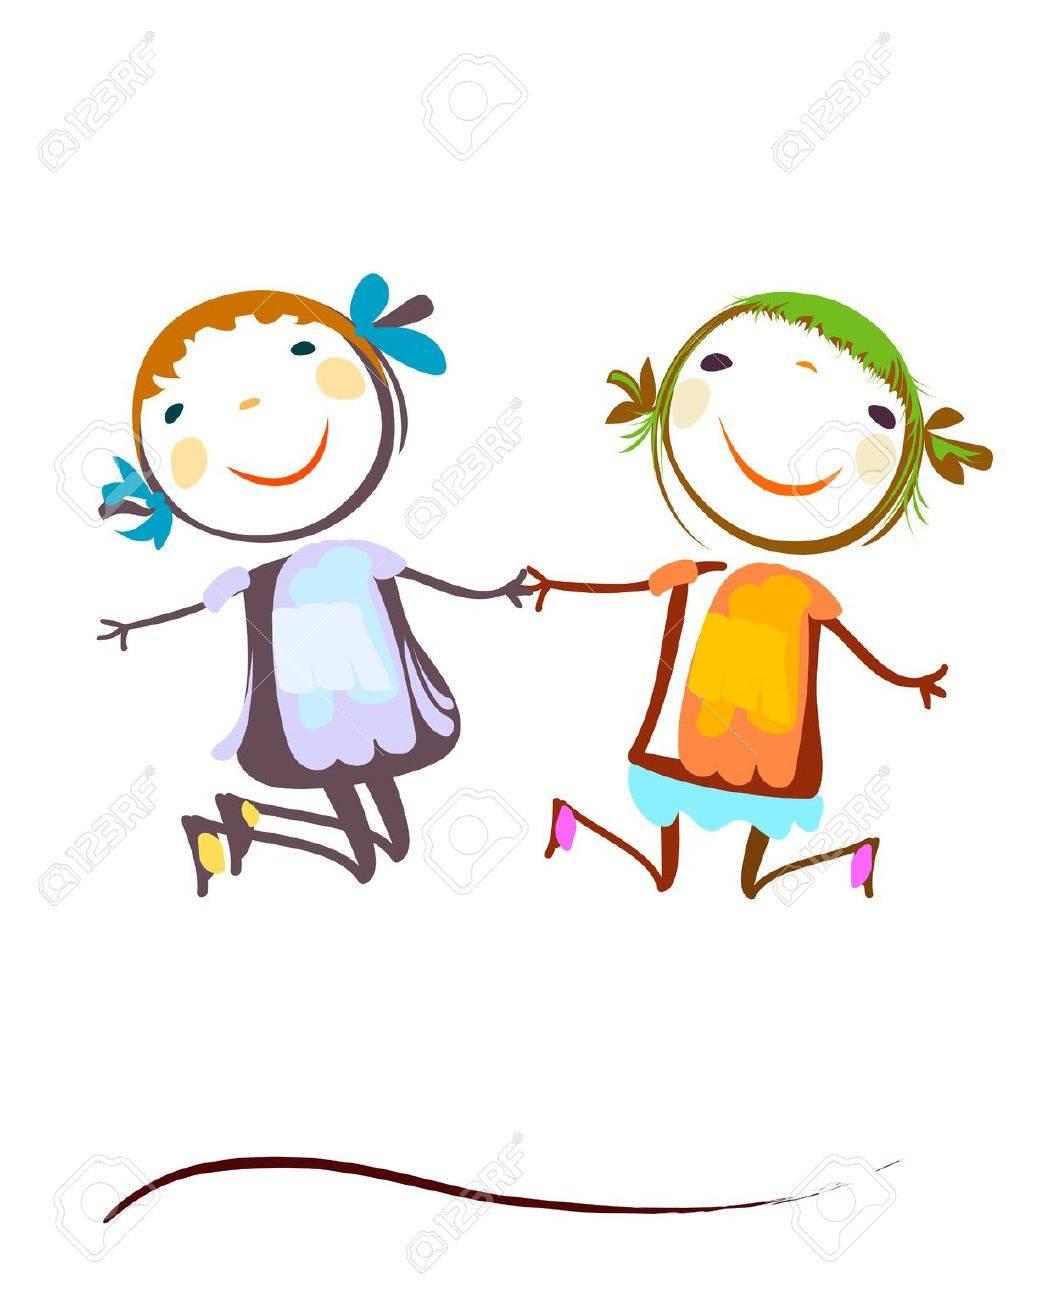 happy kids jumping - 39980716